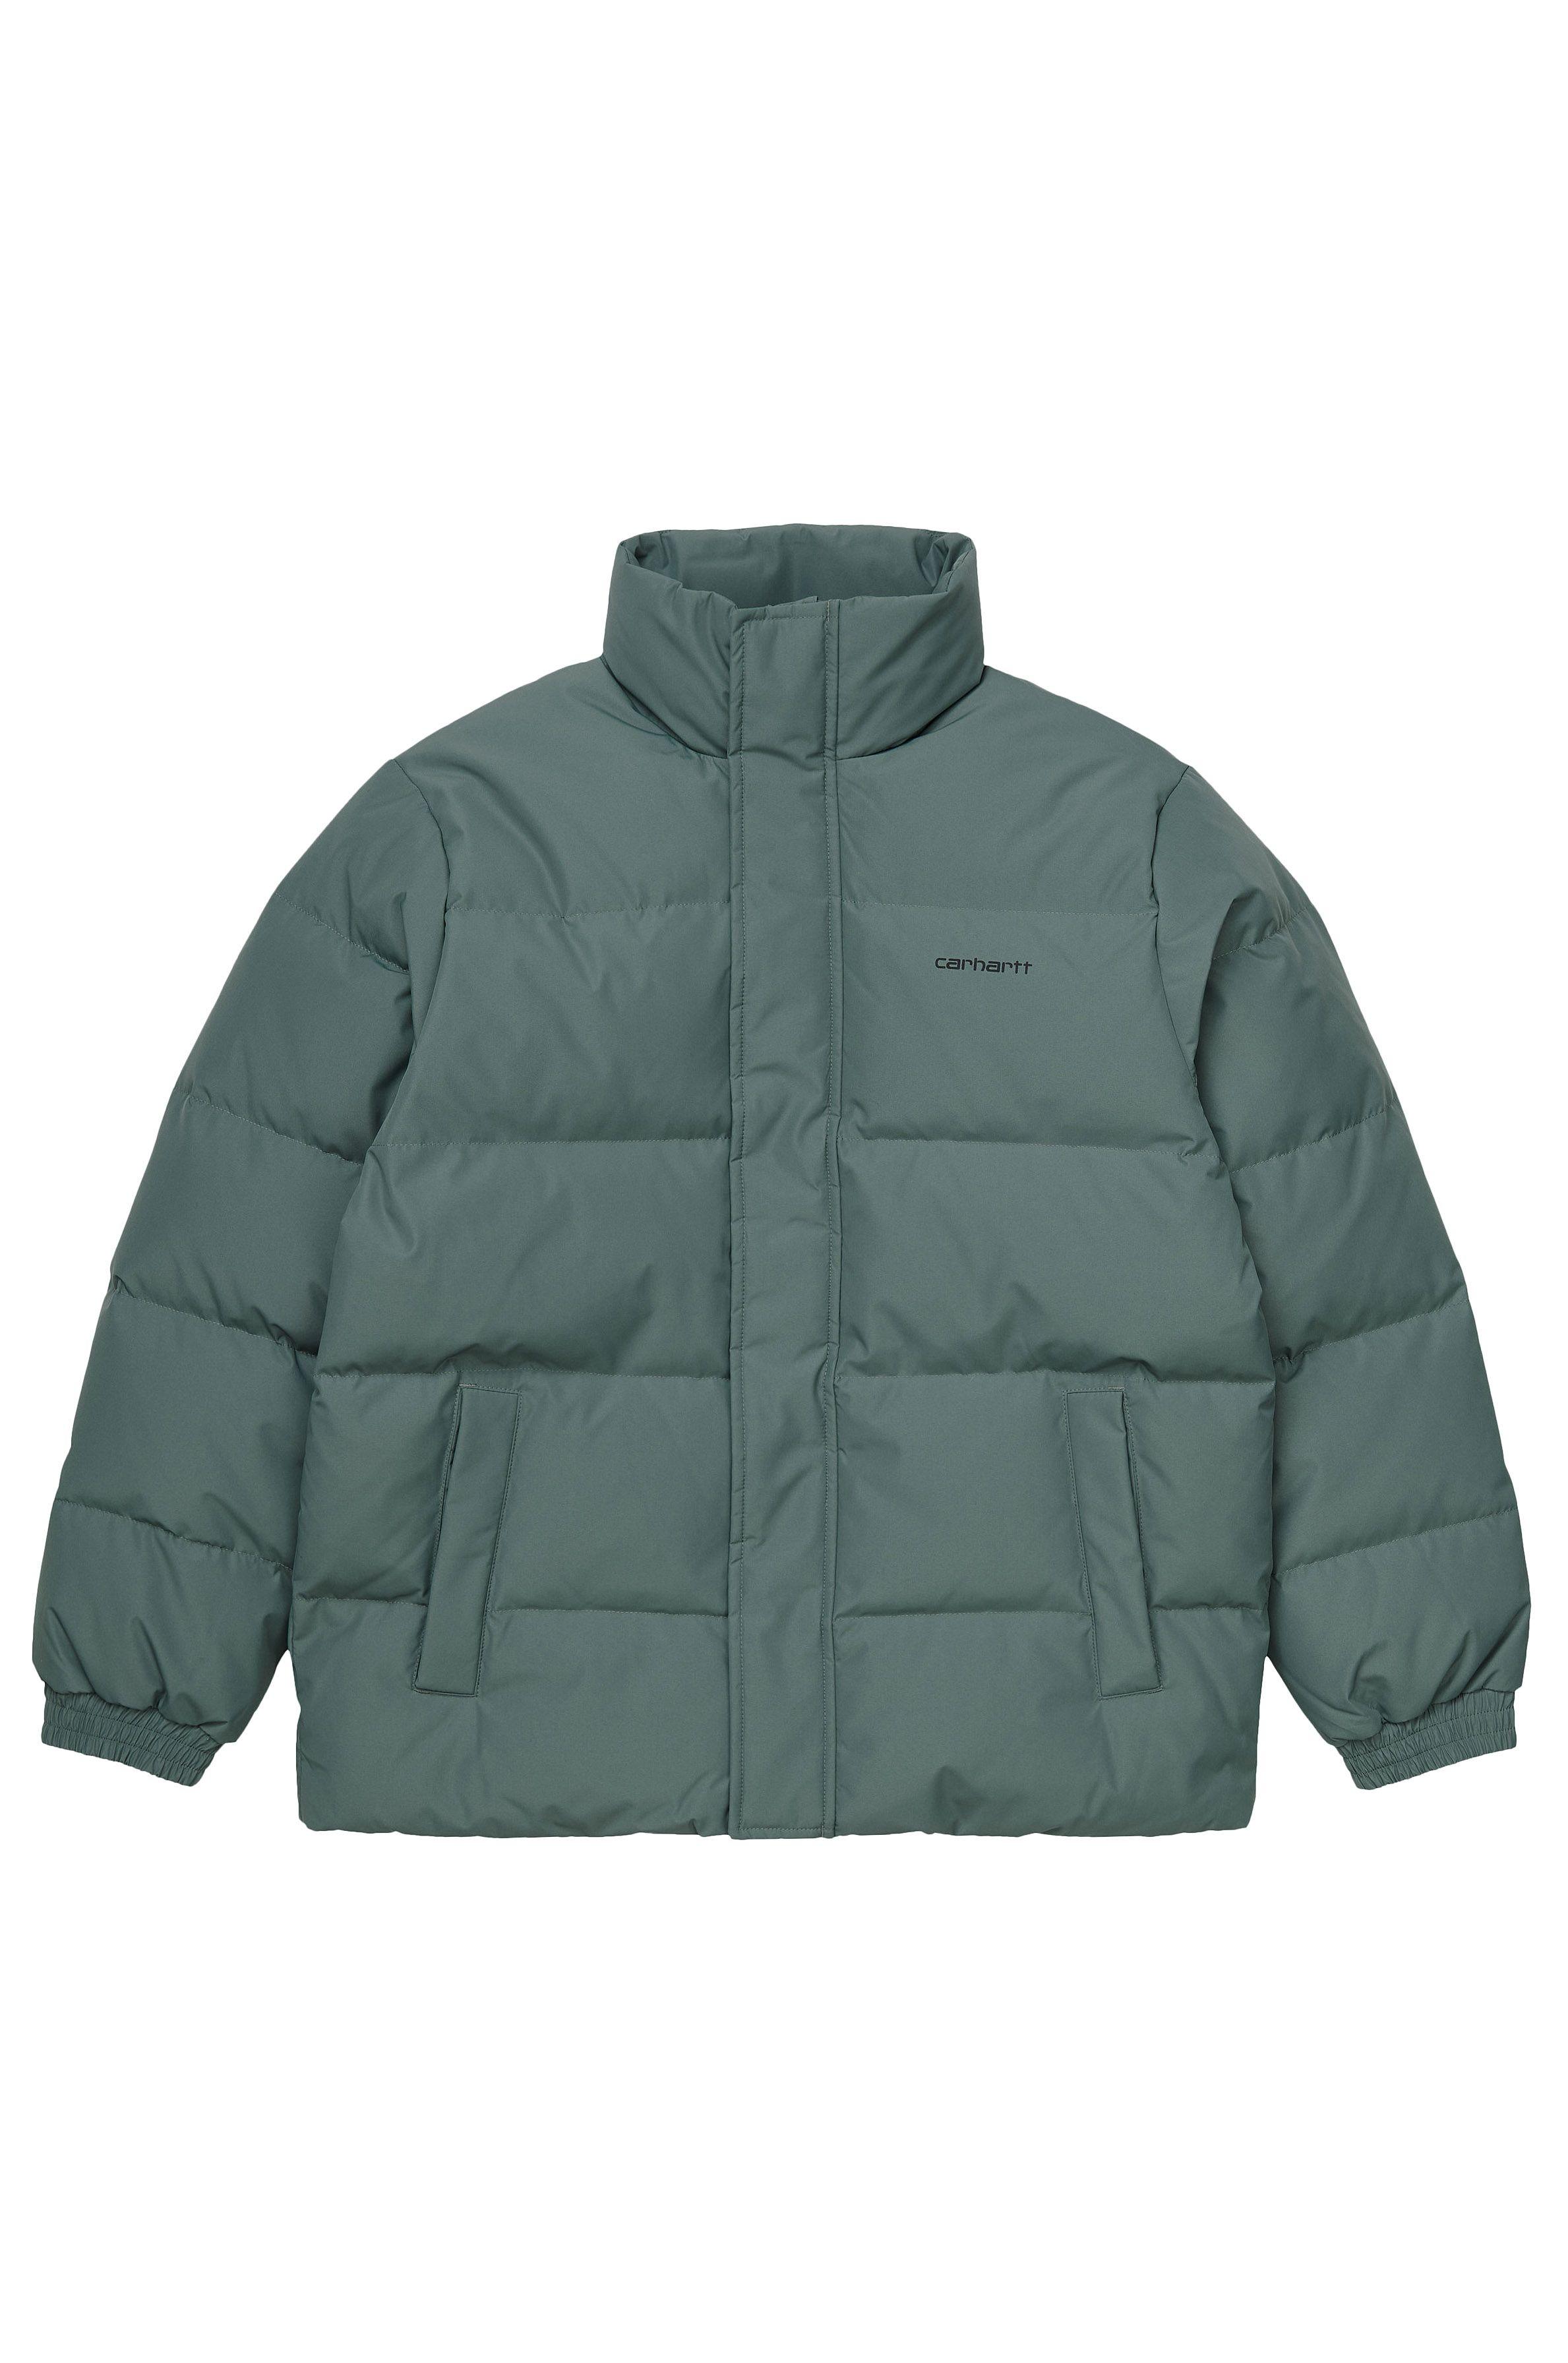 Carhartt WIP Jacket DANVILLE Eucalyptus/Black